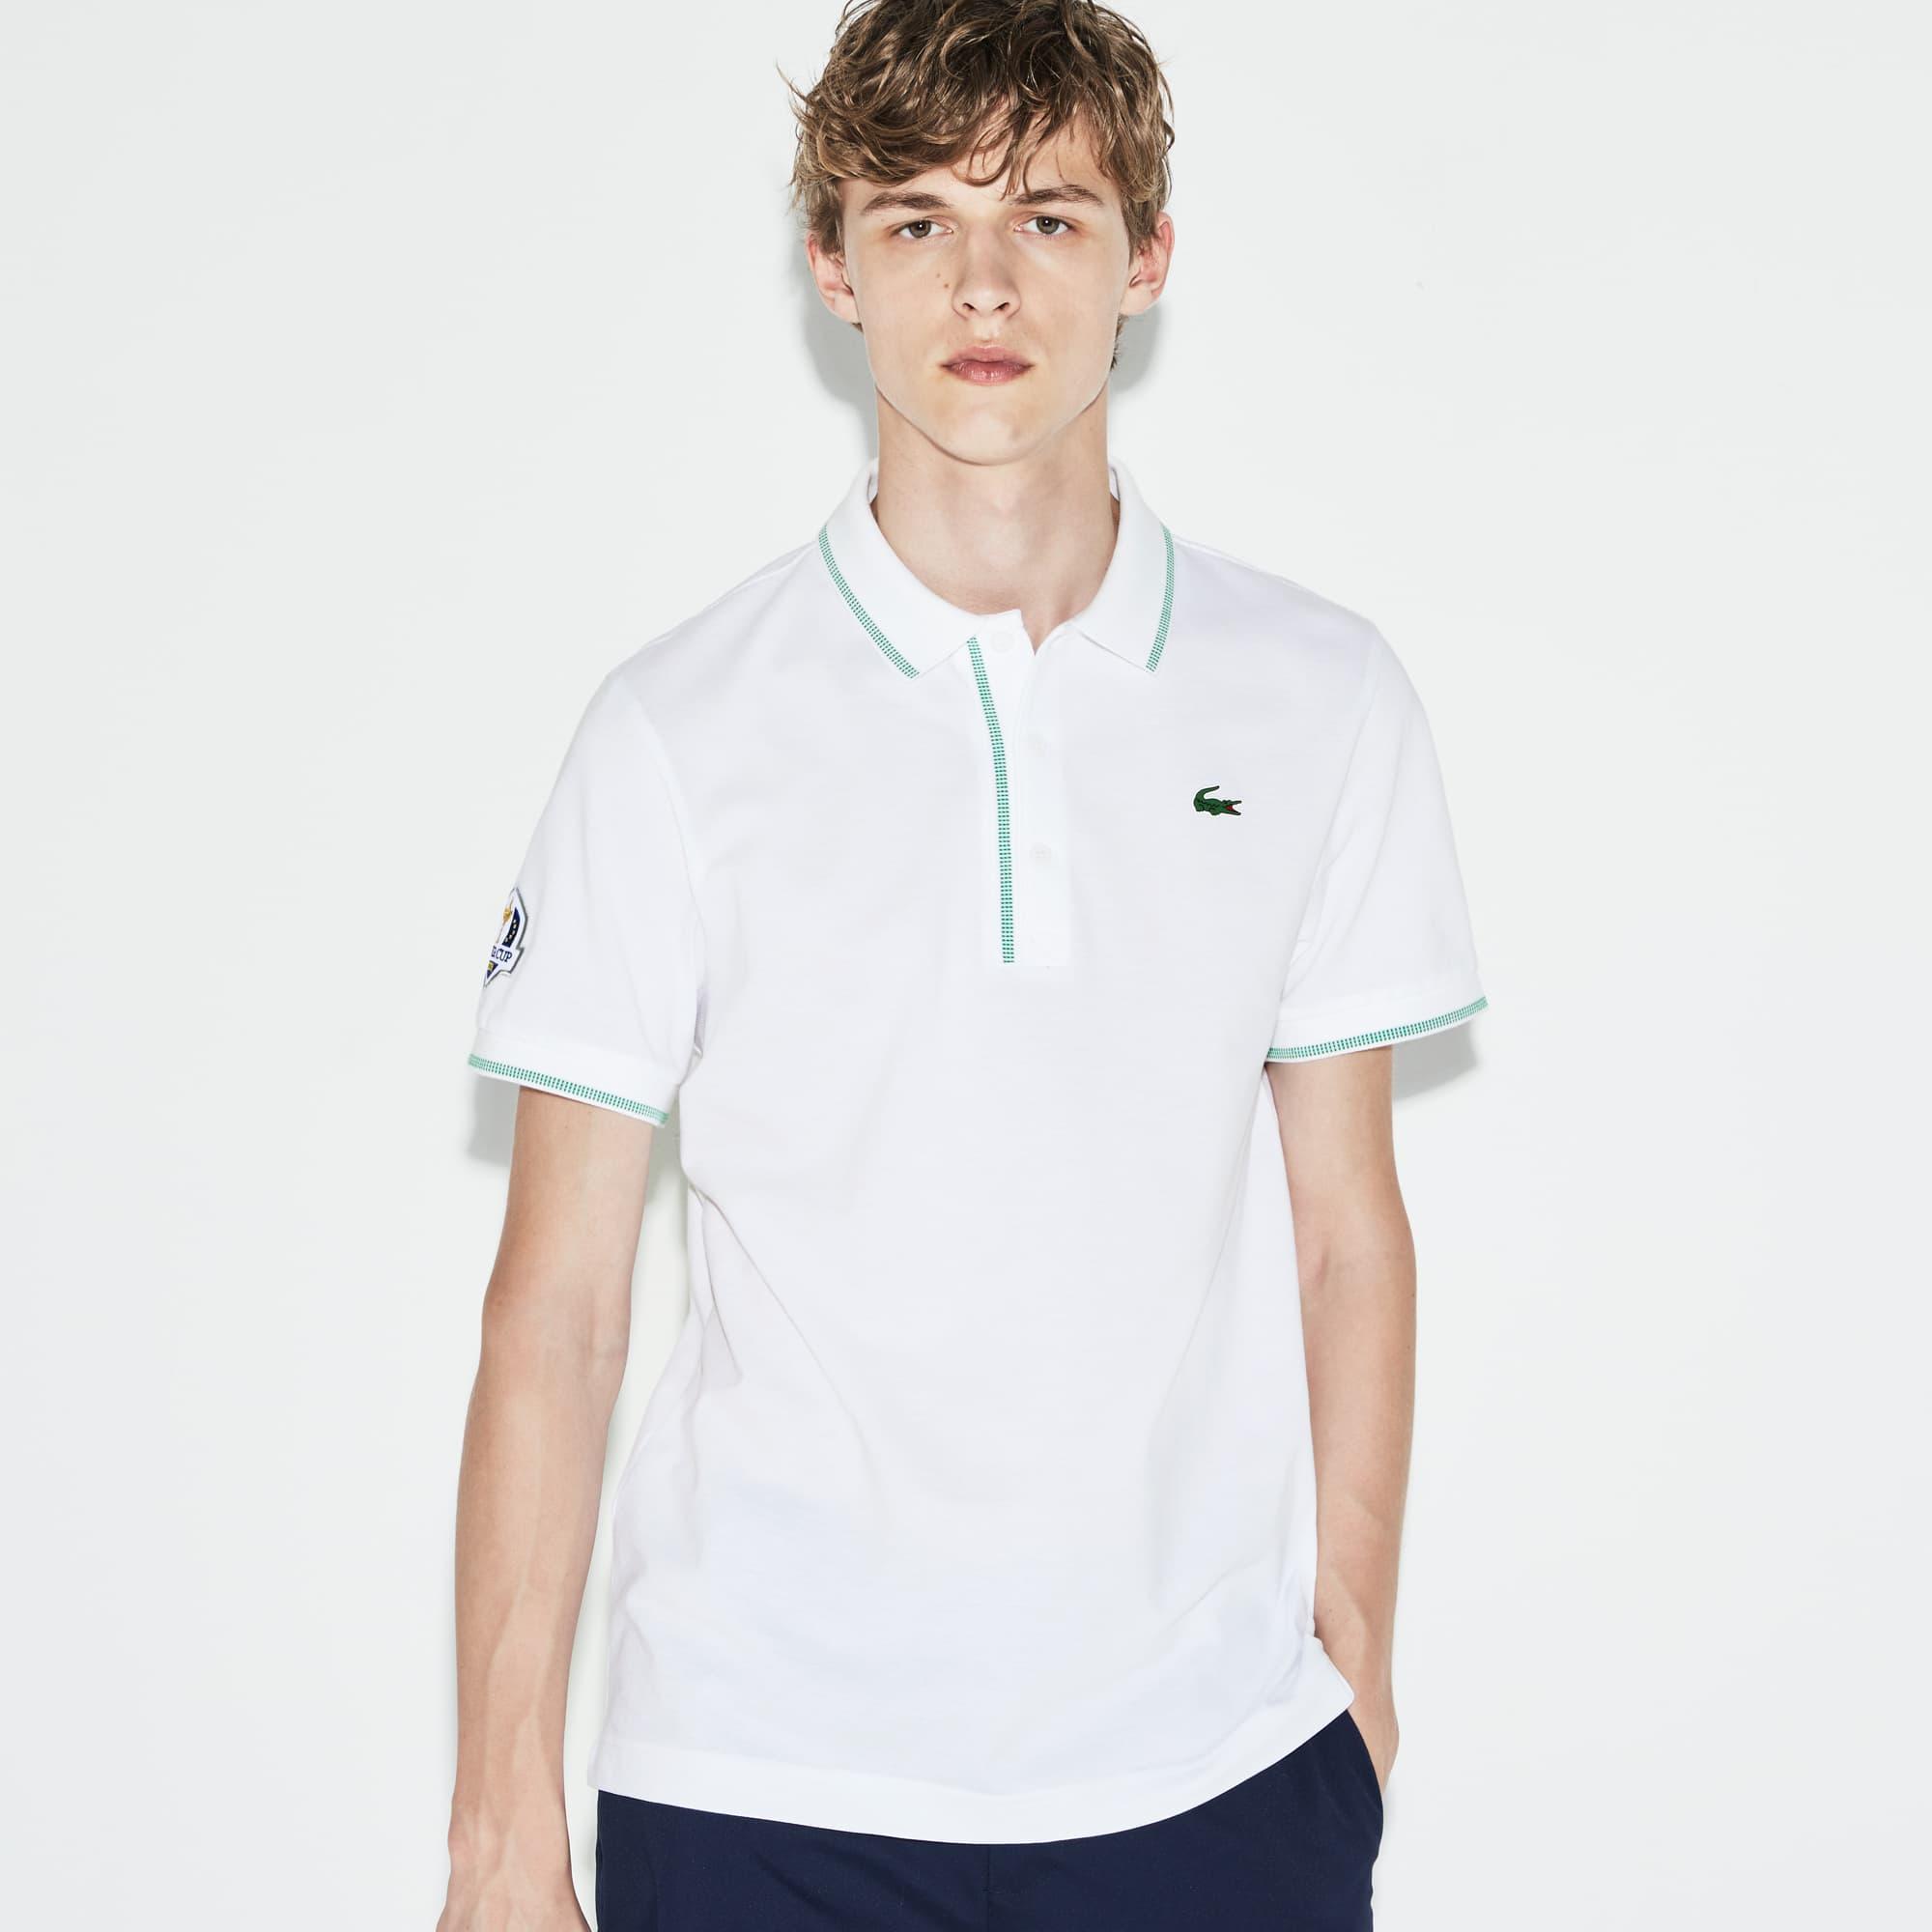 Lacoste - Herren LACOSTE SPORT Ryder Cup Edition Golf Poloshirt mit Paspeln - 6